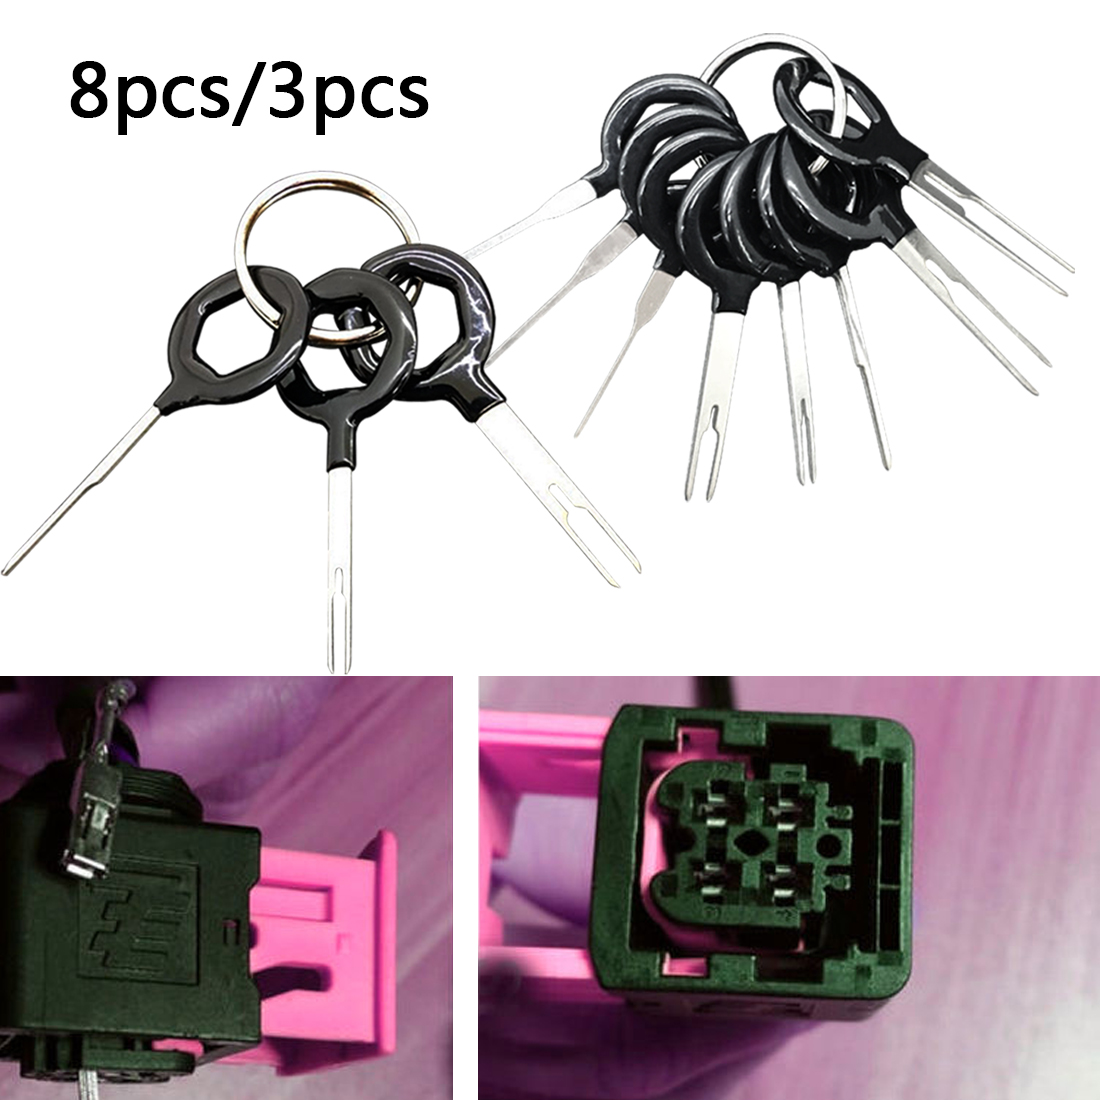 11pcs Car Electrical Wiring Crimp Connector 8pcs/3pcs Terminal Removal Tools Pin Extractor Kit Car Repair Plug Key Hand Tool Set